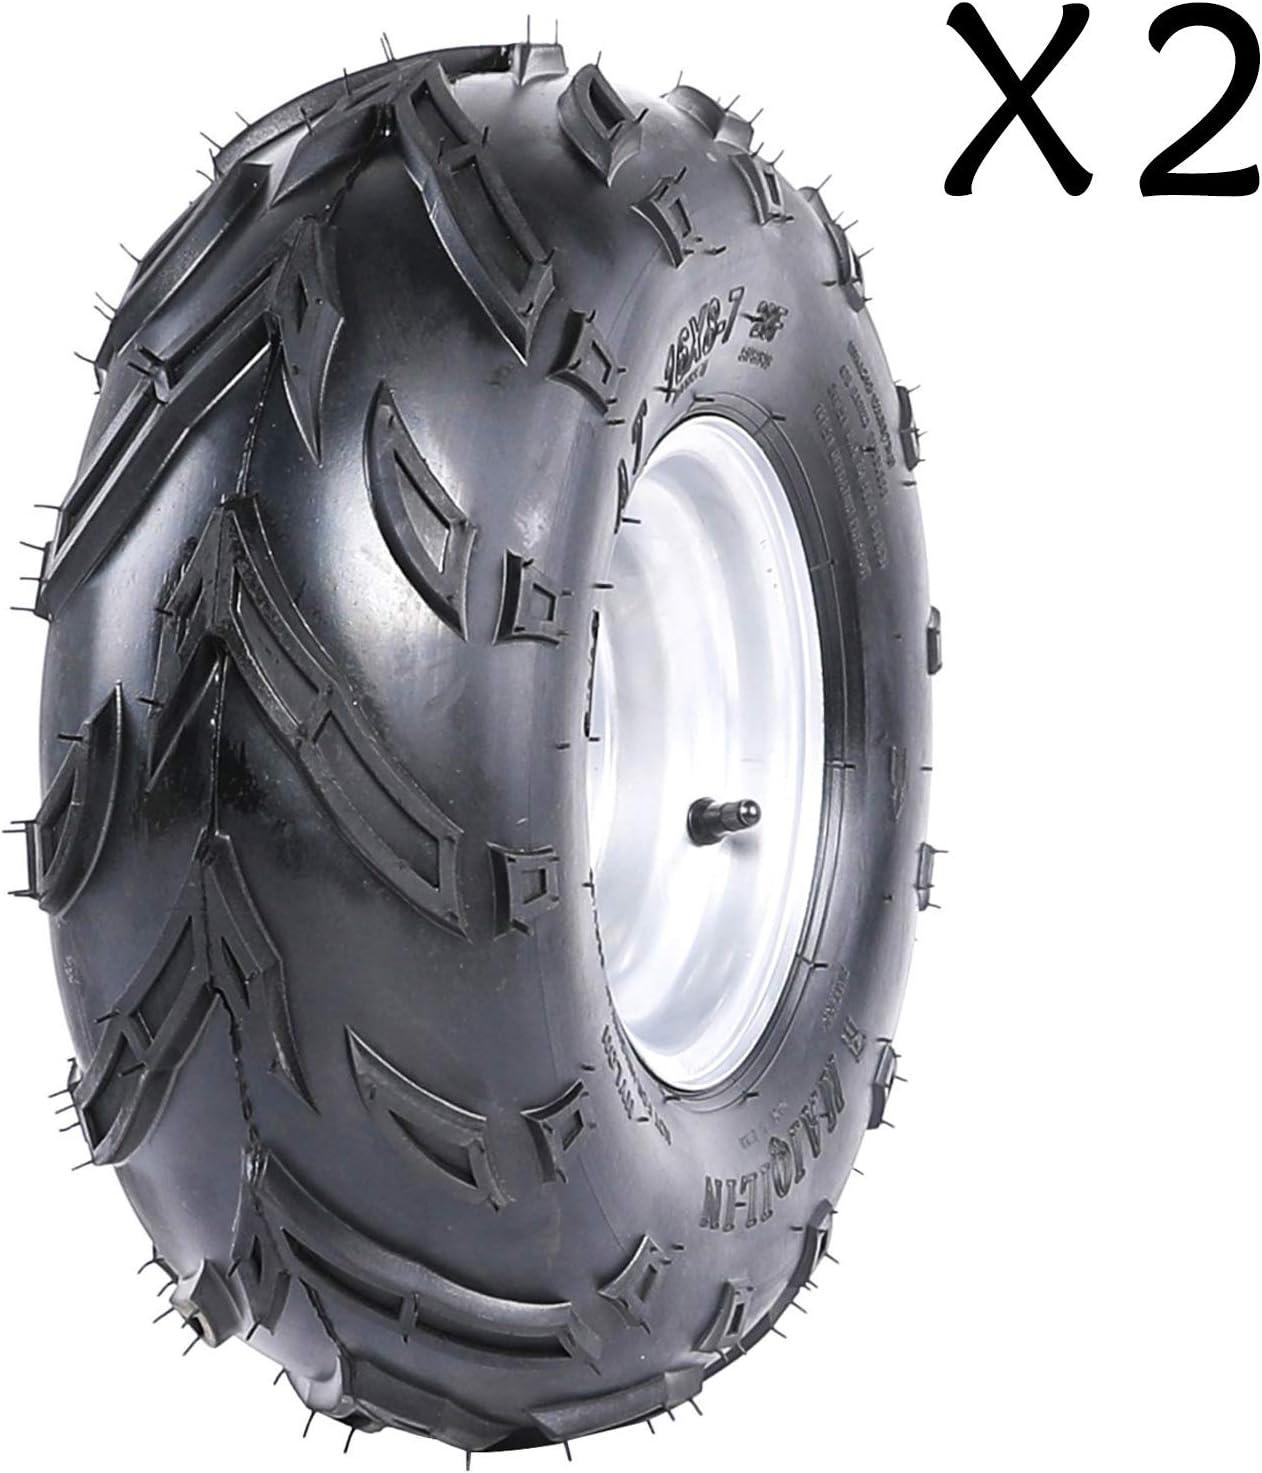 AR DONGFANG 2pcs ATV Tires 16X8-7 Tubeless Quad UTV Go Kart Tires ATV Tire 4PR